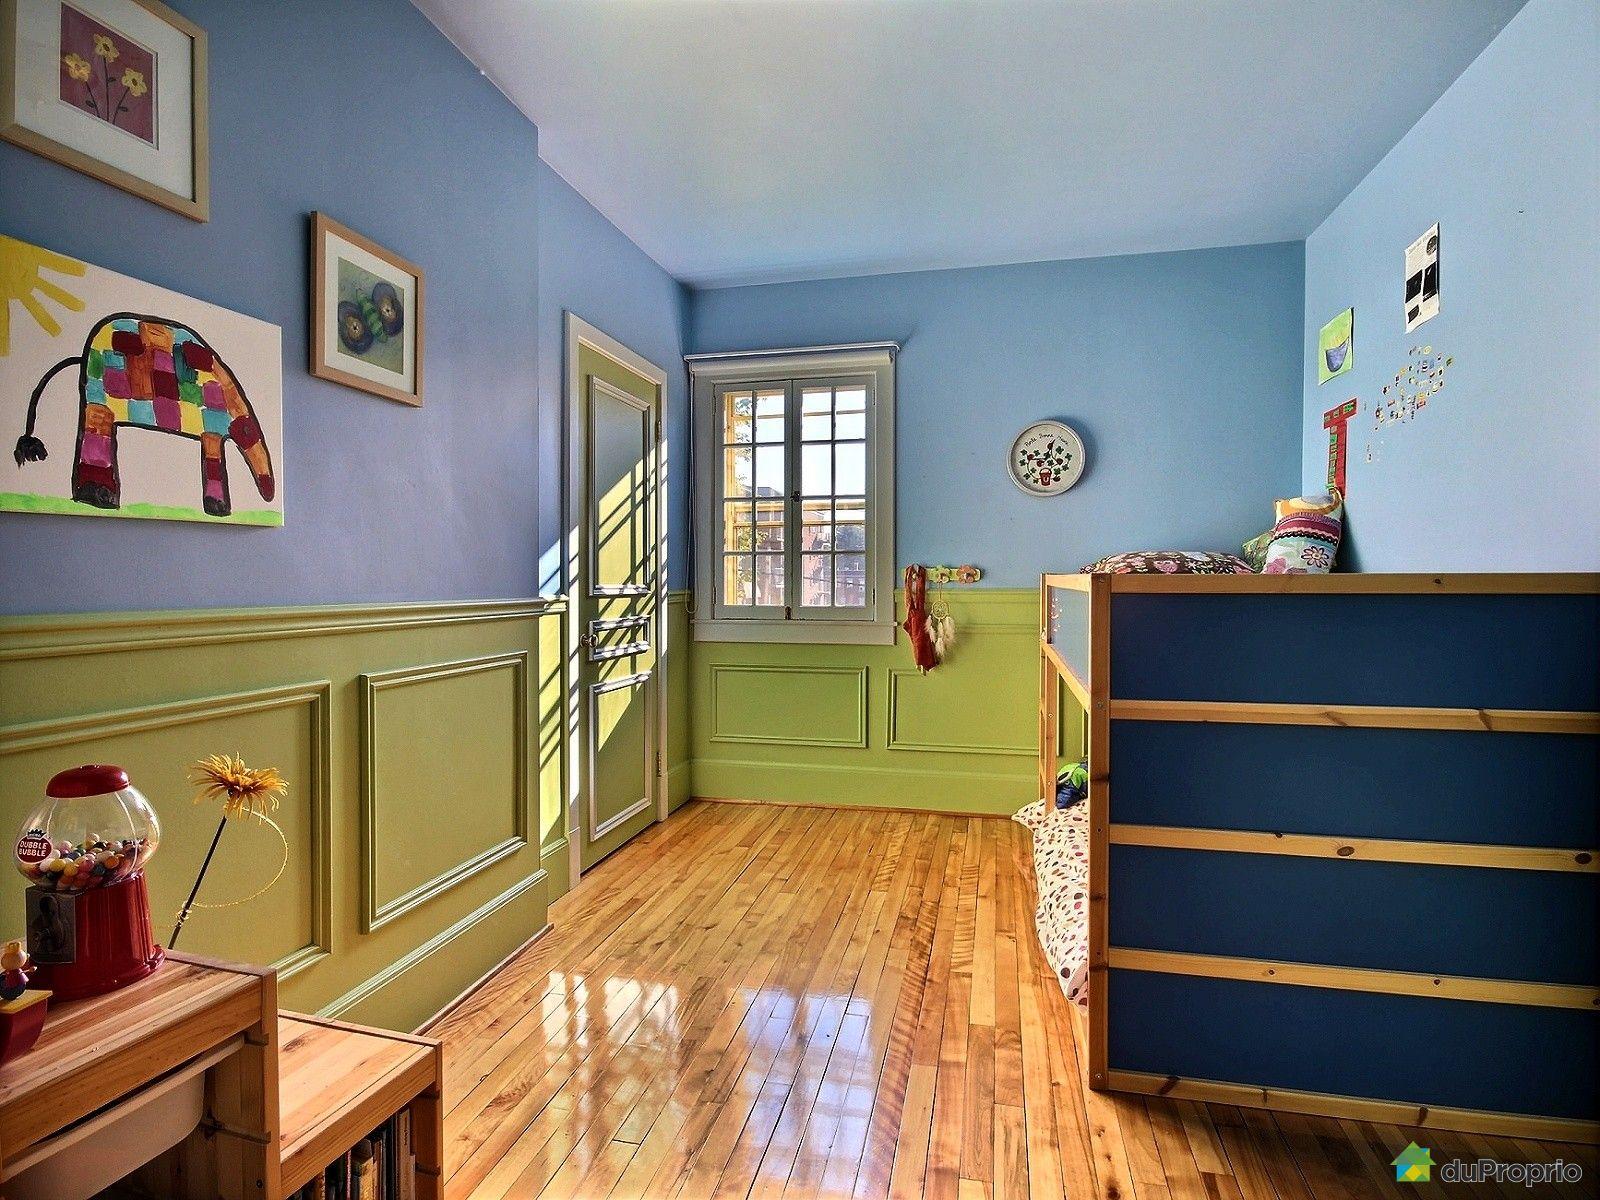 Maison  vendre Sherbrooke 51 rue de Vimy immobilier Qubec  DuProprio  637029